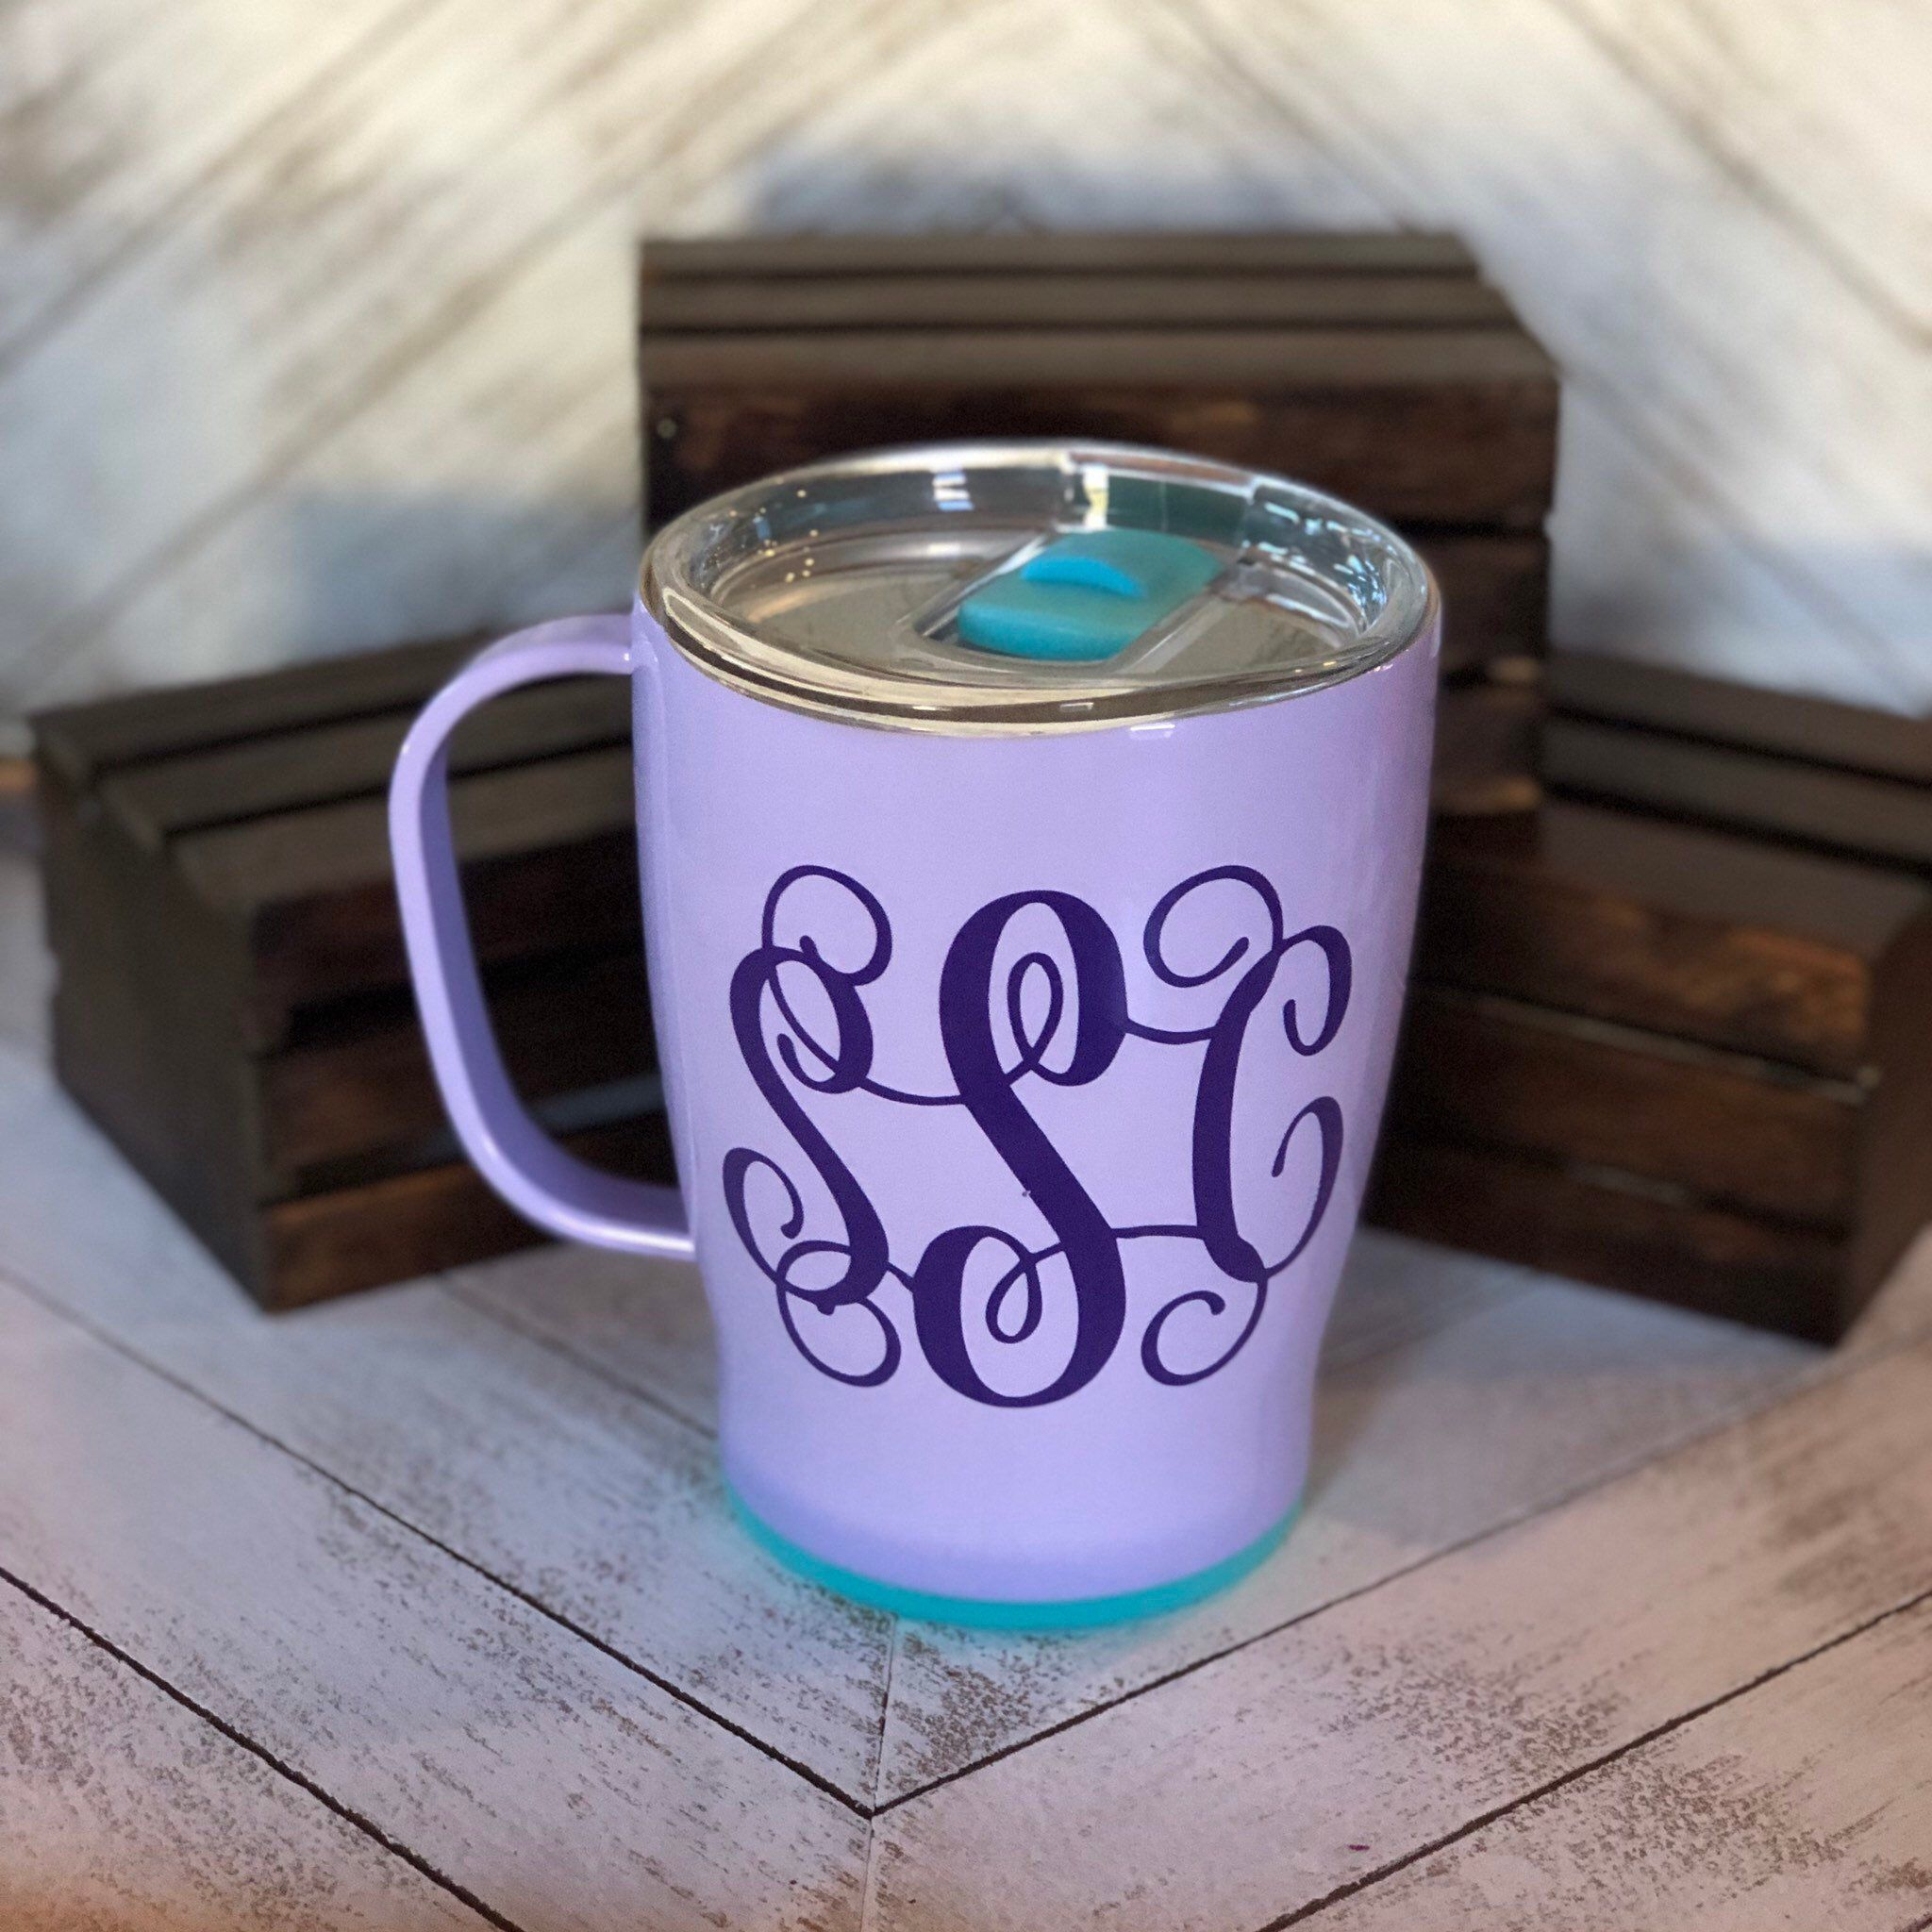 Personalized Coffee Mug Insulated Coffee Mug Coffee Mug With Etsy Mugs Personalized Coffee Mugs Insulated Coffee Mugs